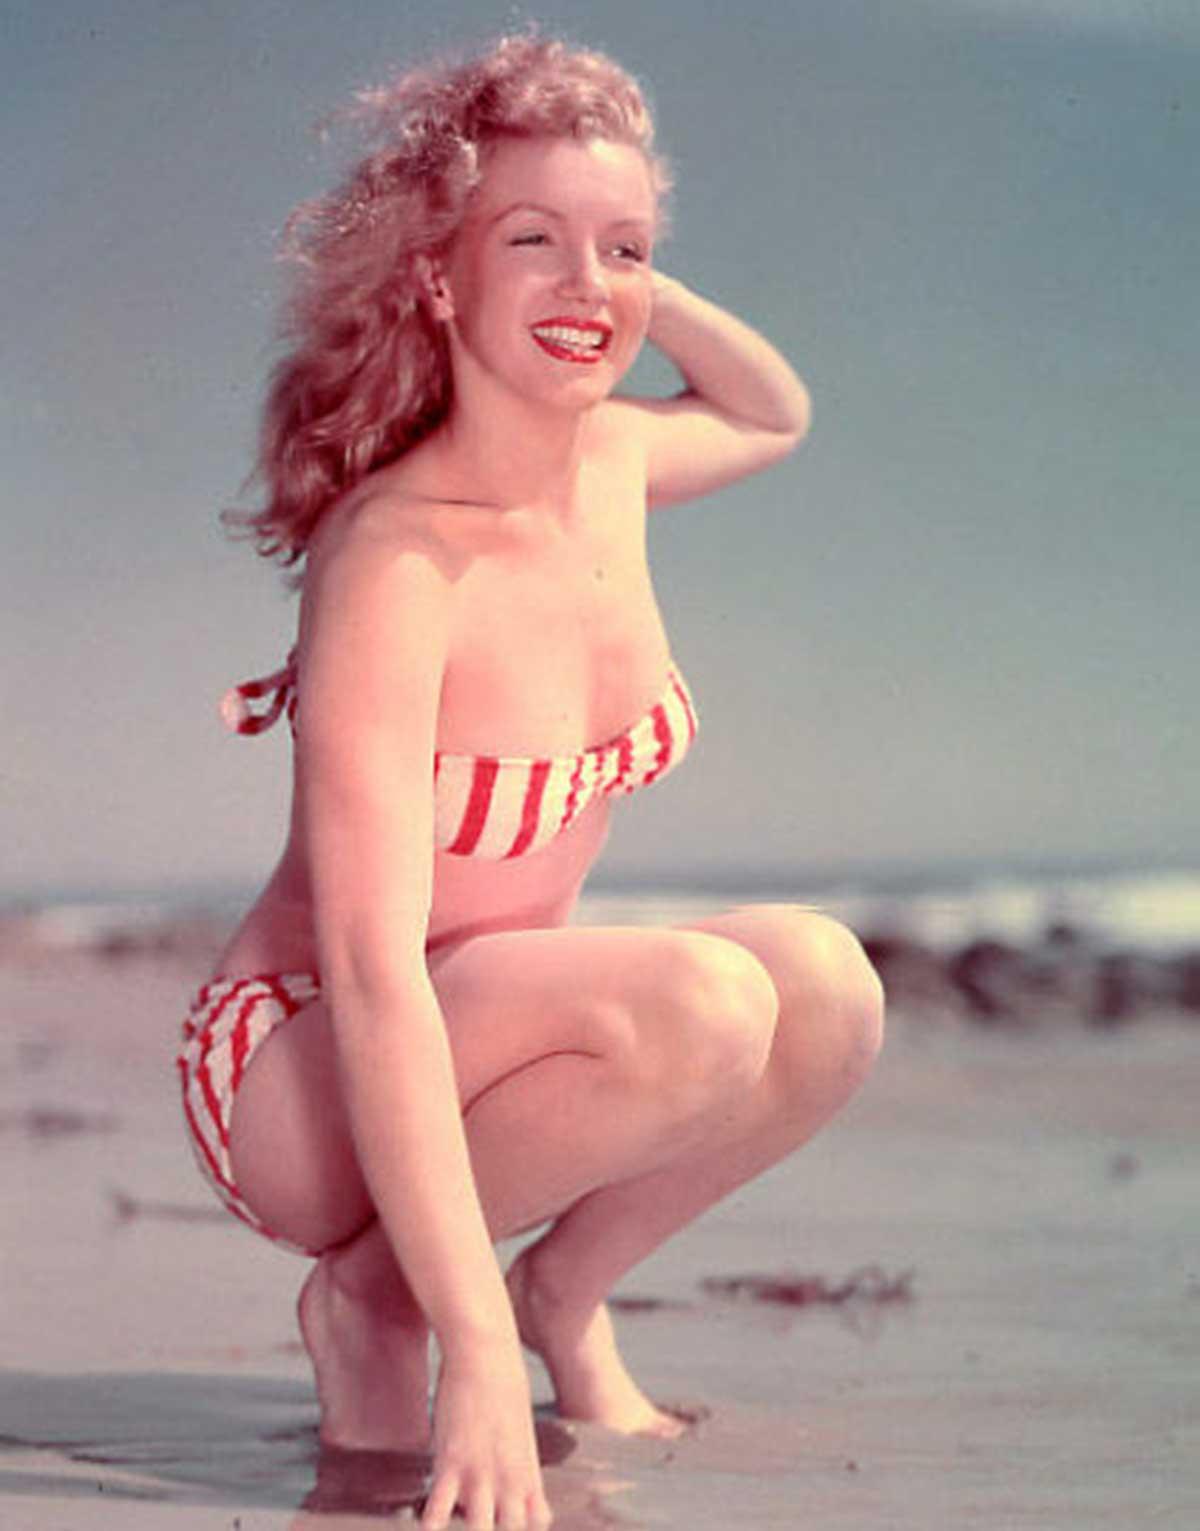 Marilyn-Munroe-models-a-French-Bikini-in-1947